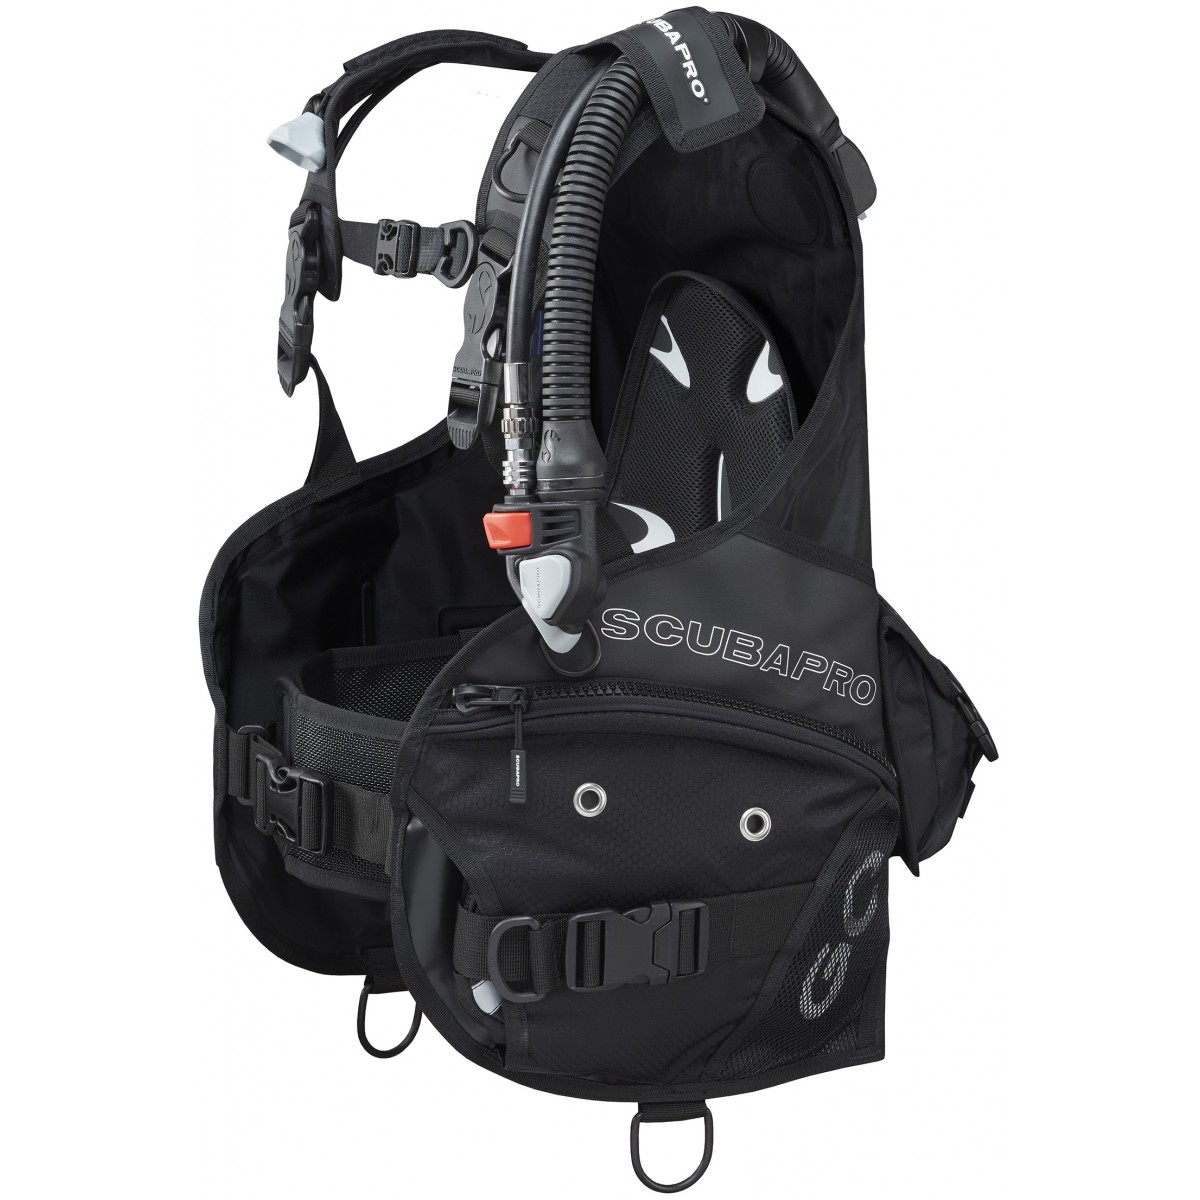 Scubapro Go Jacket Style BCD Travel - Air 2